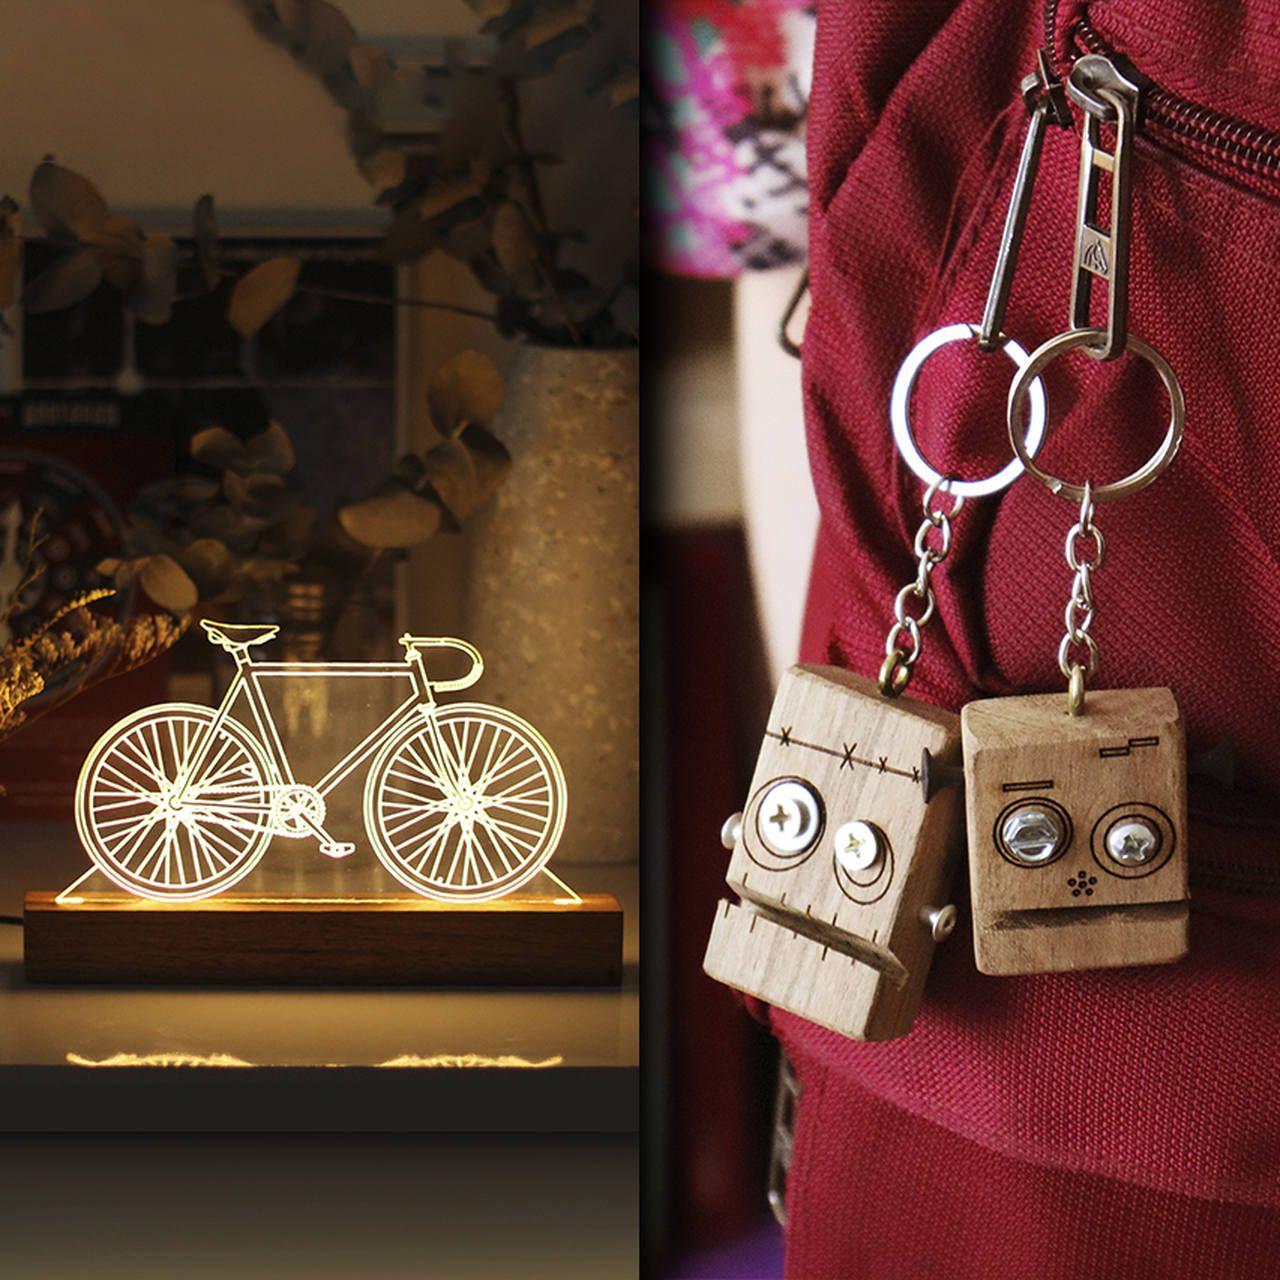 Kit Dia dos Namorados - 1 luminária Bicicleta Fixa + 2 chaveiros